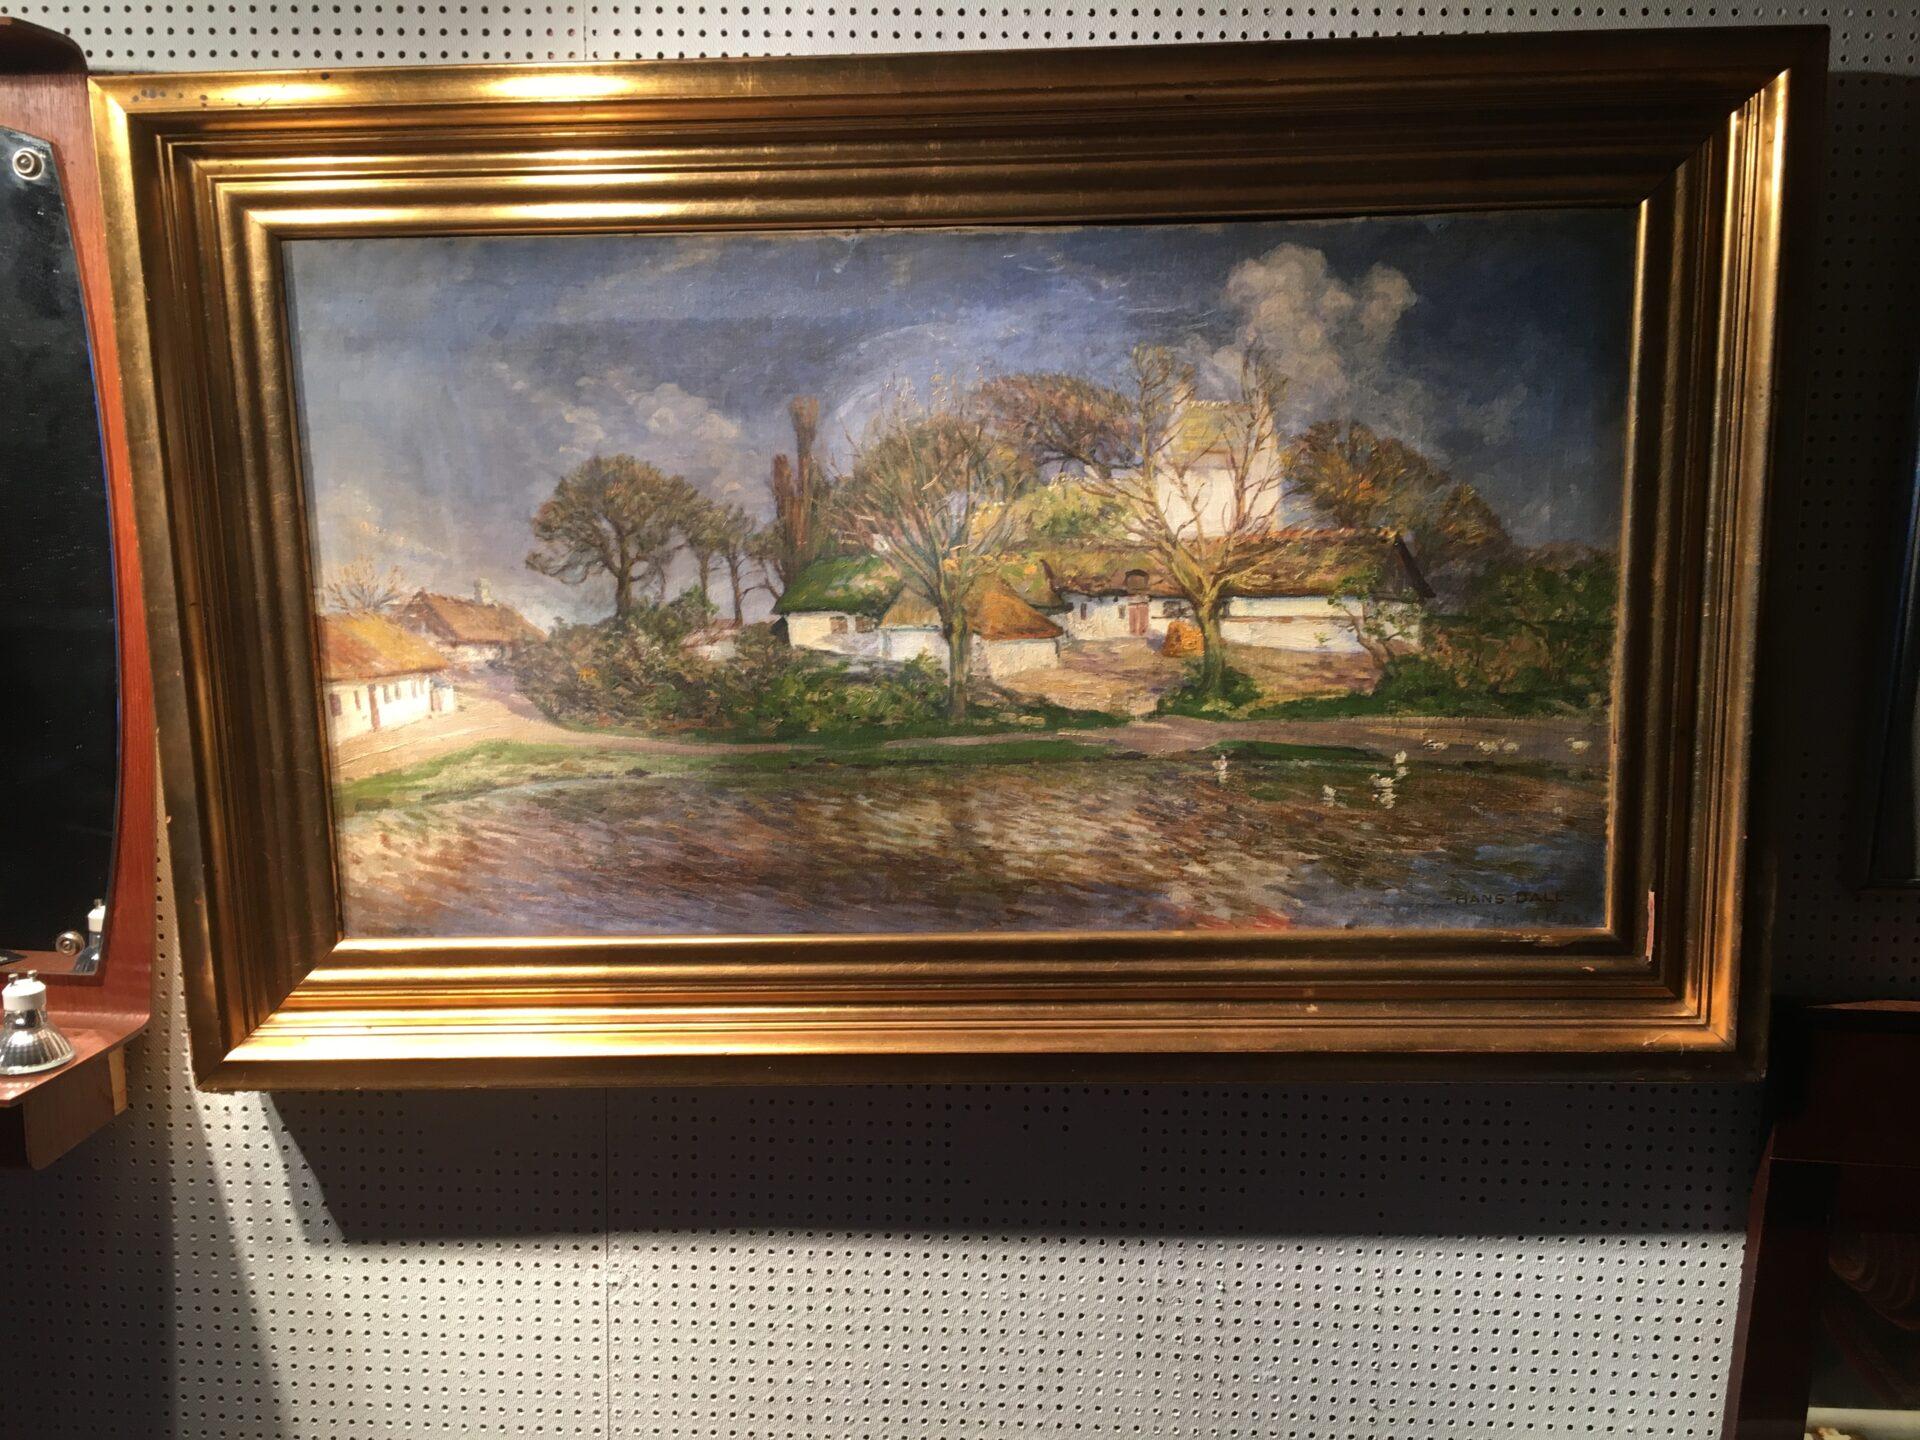 Maleri sign. Hans Dall, rammemål: 96x69 cm, pris 400 kr